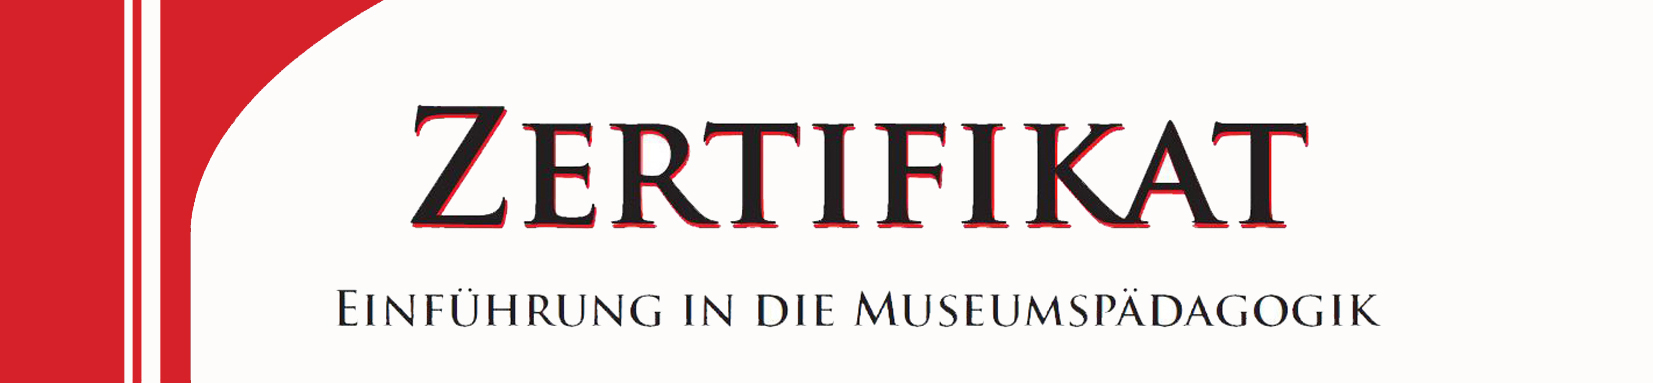 Zertifikatskurs Museumspädagogik 2020